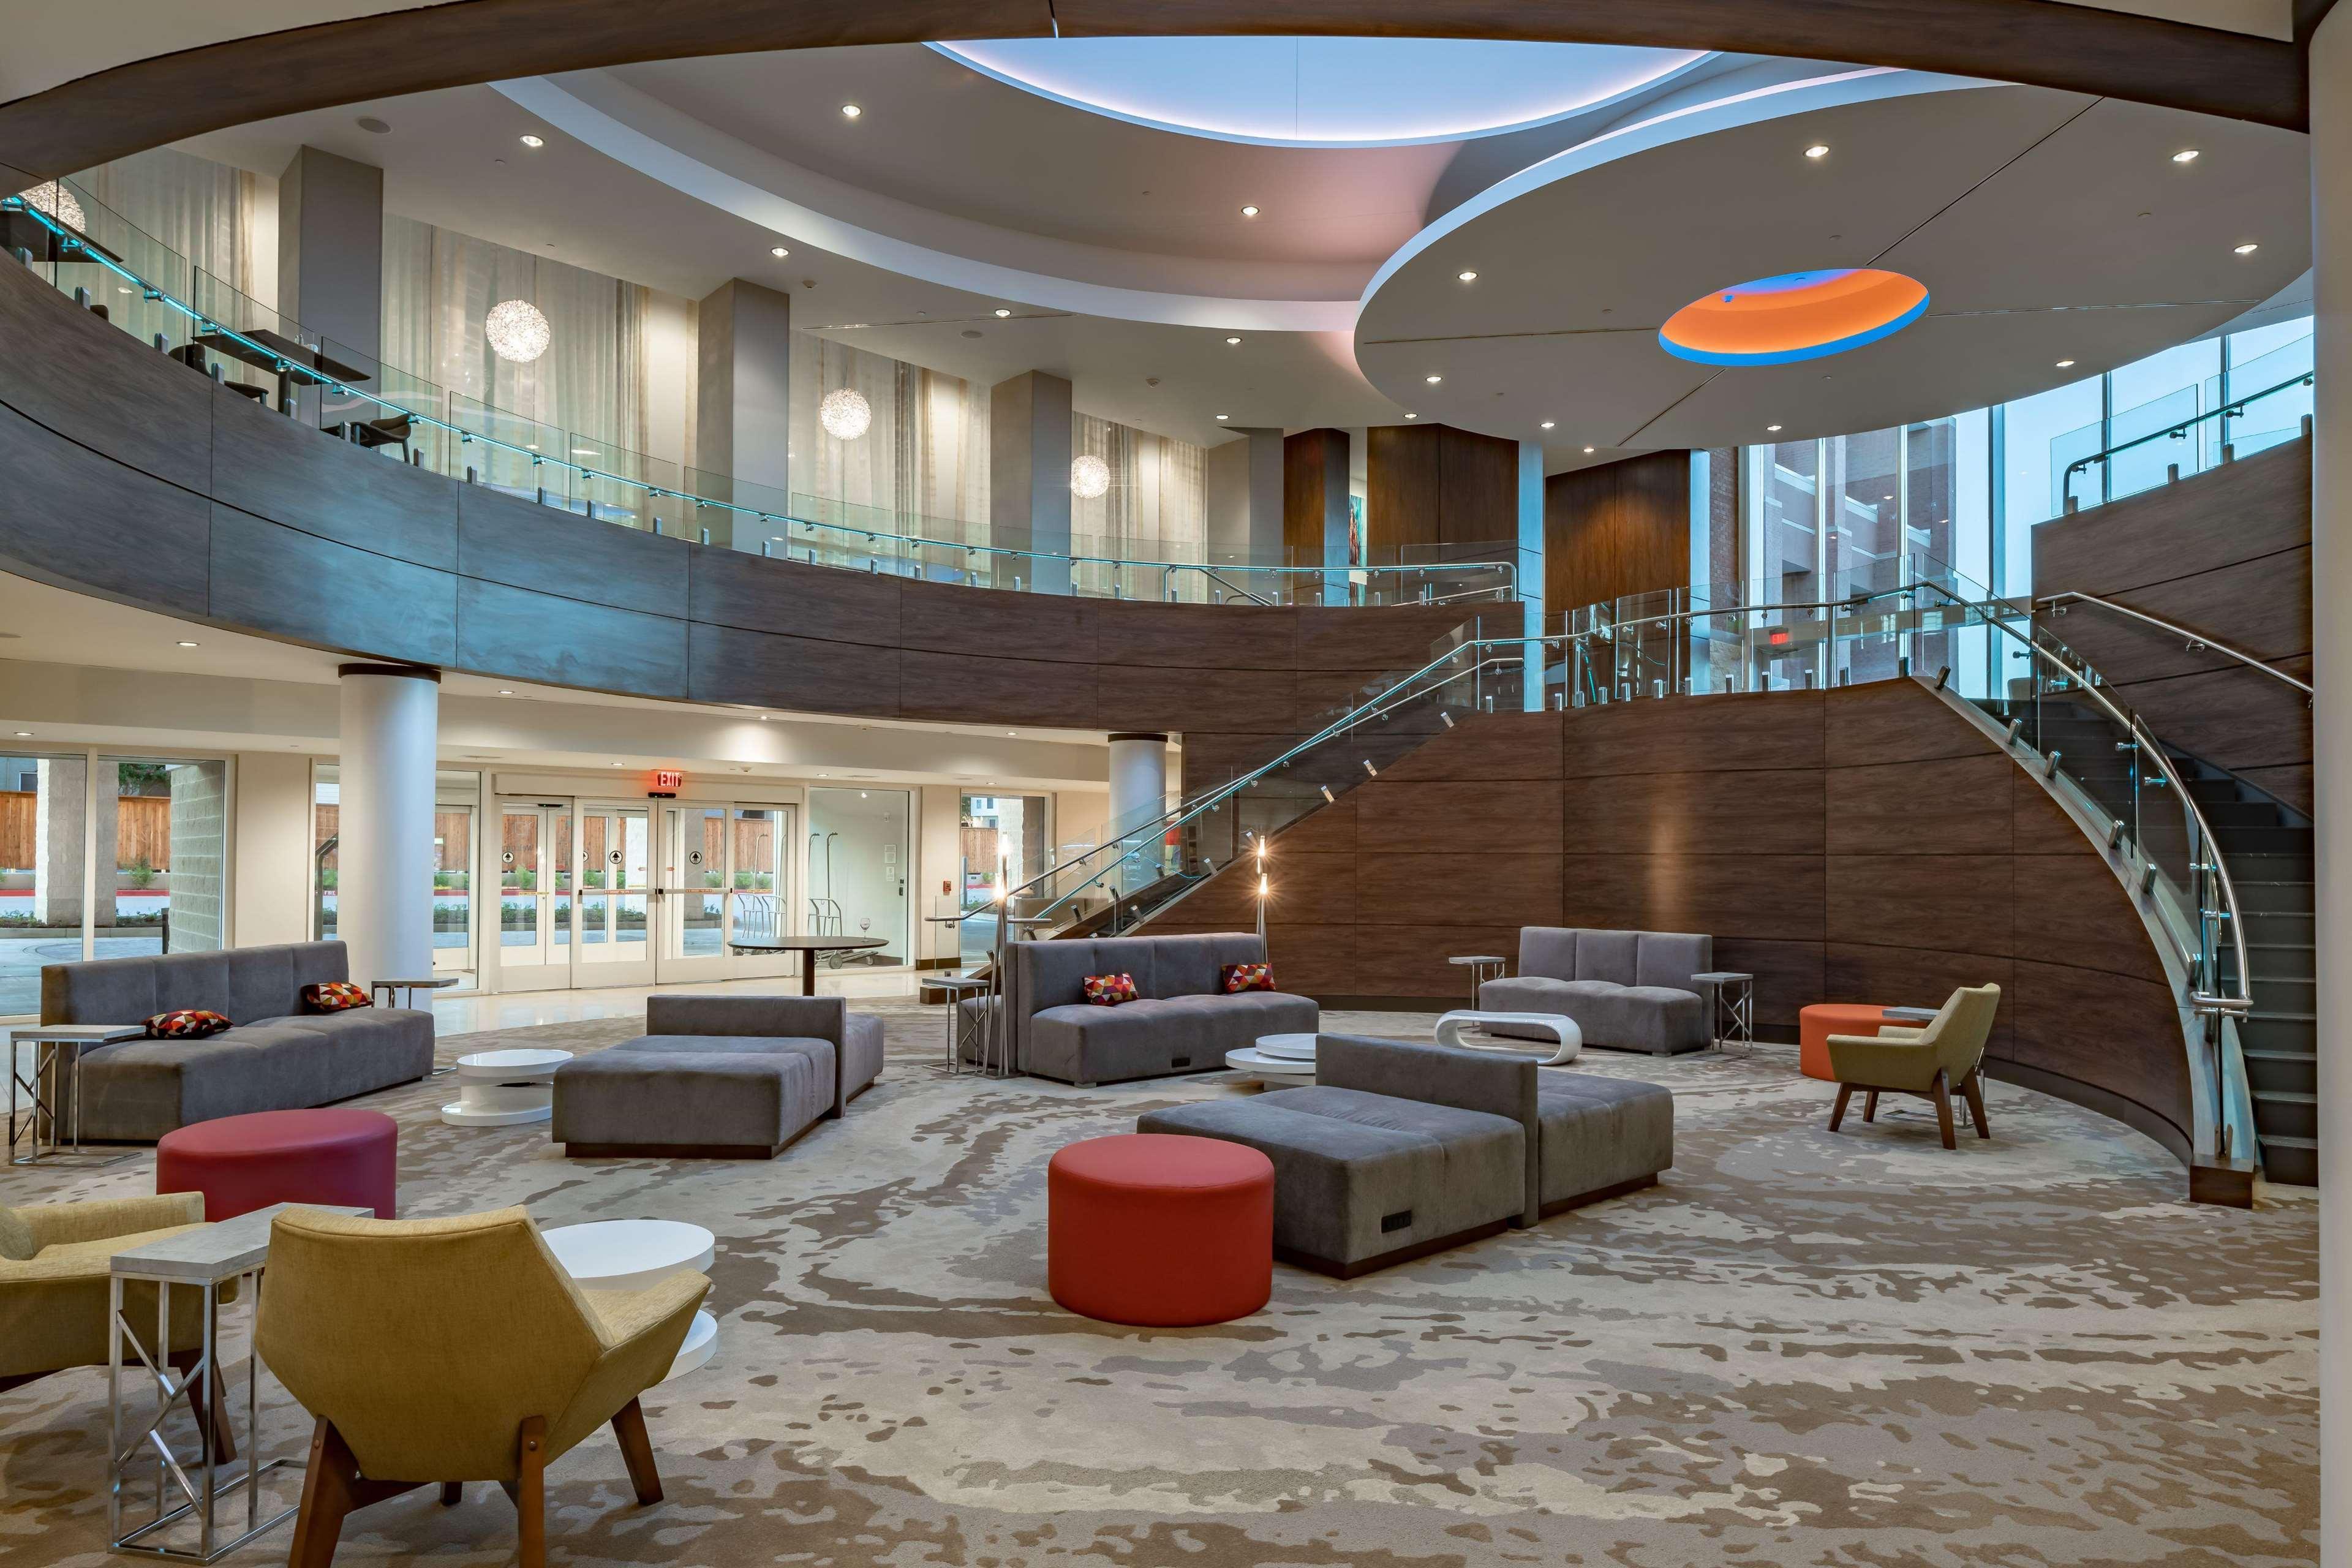 Hilton Garden Inn Dallas at Hurst Conference Center image 8